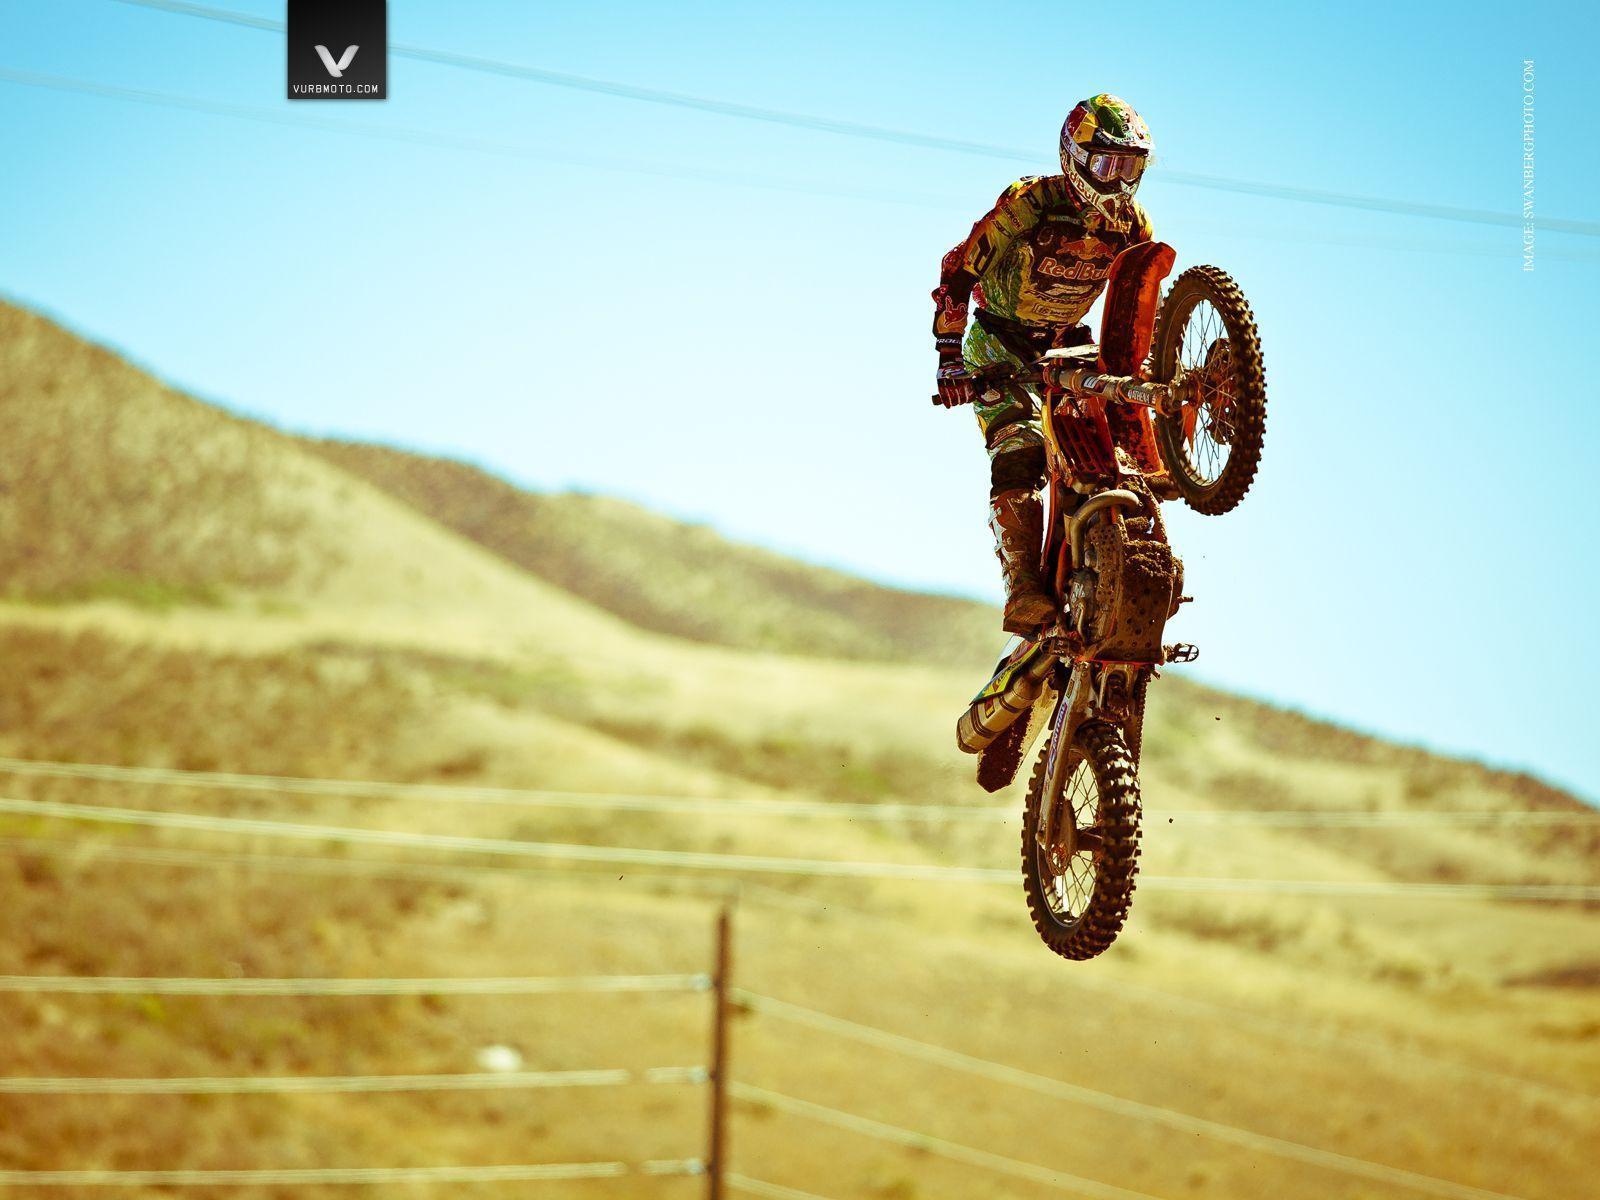 Motocross Wallpapers 2016 1600x1200